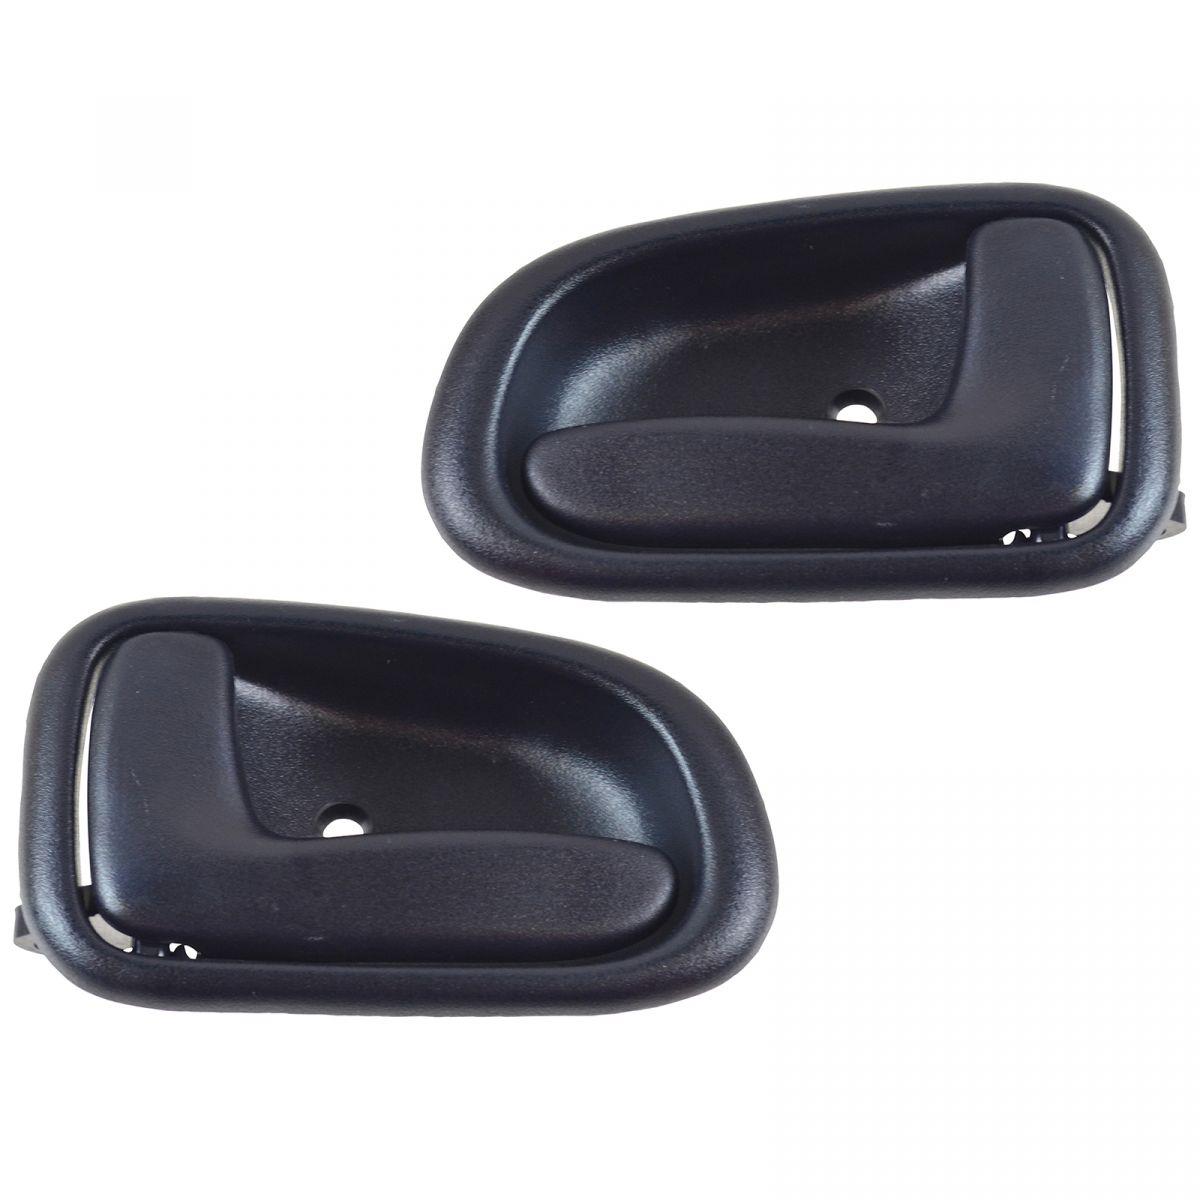 Pair Inside Interior Door Handle Left Right Beige For for Toyota Corolla